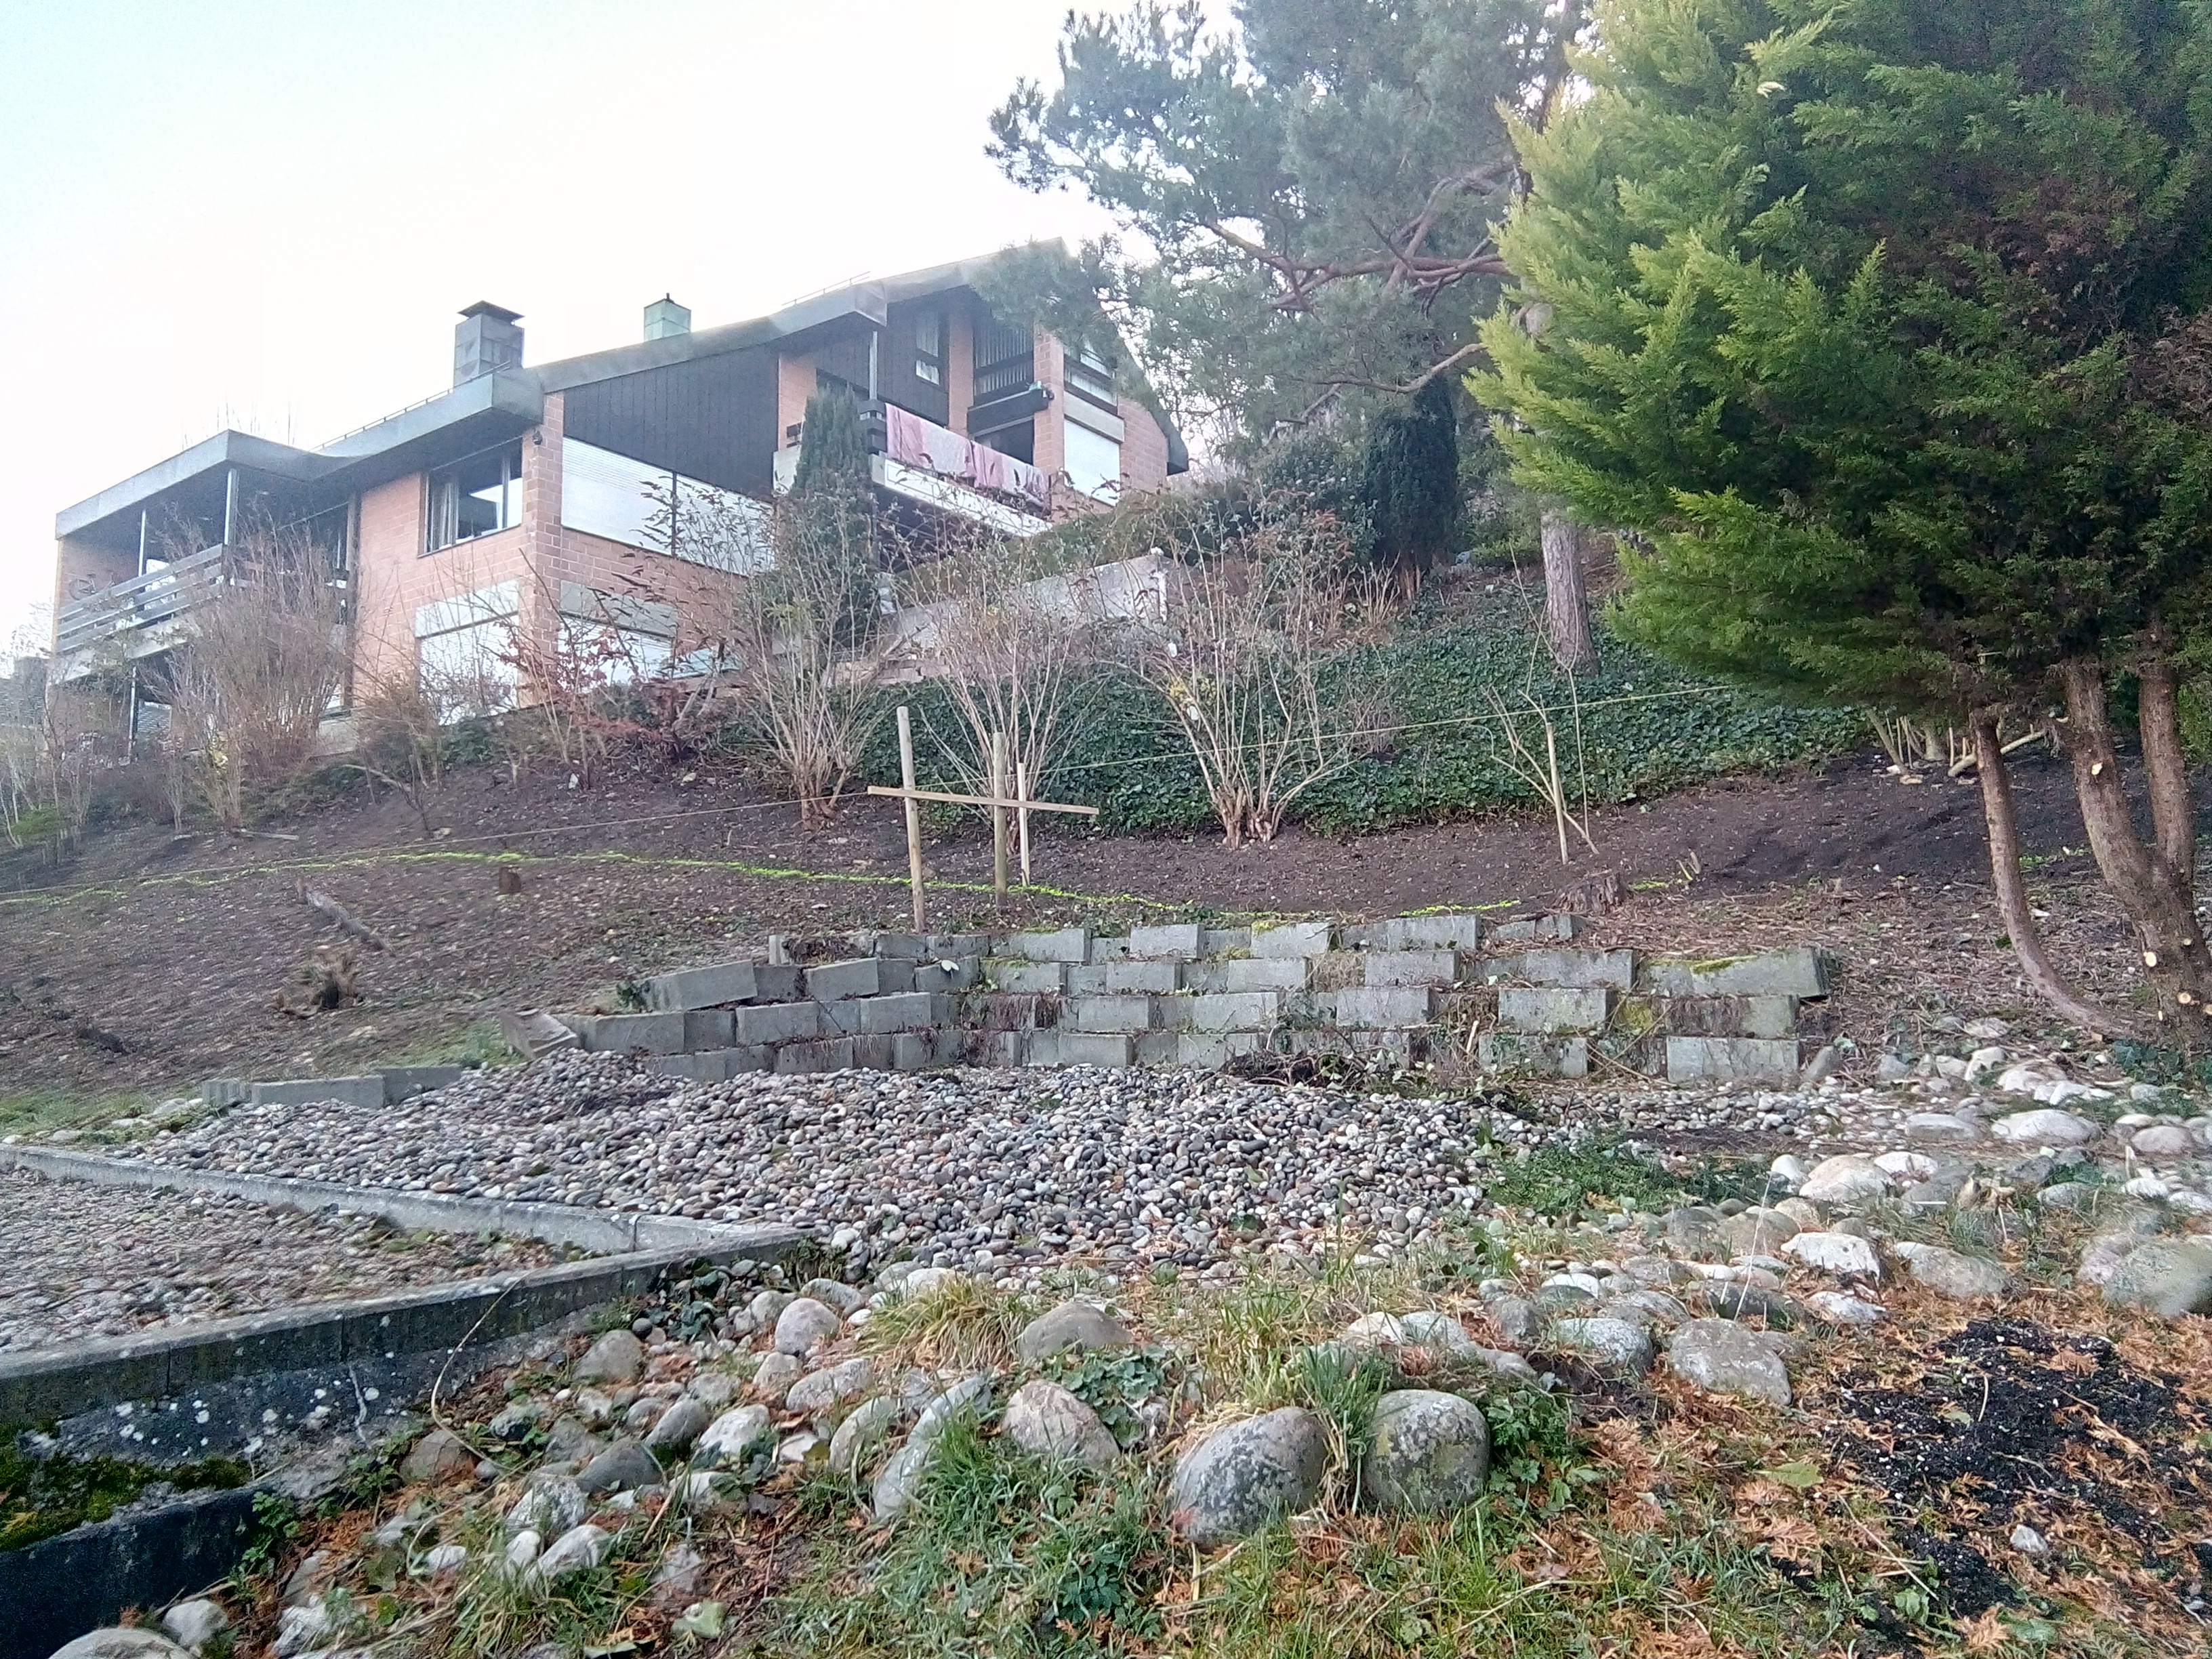 Stützmauer Jura Antico Kalkstein